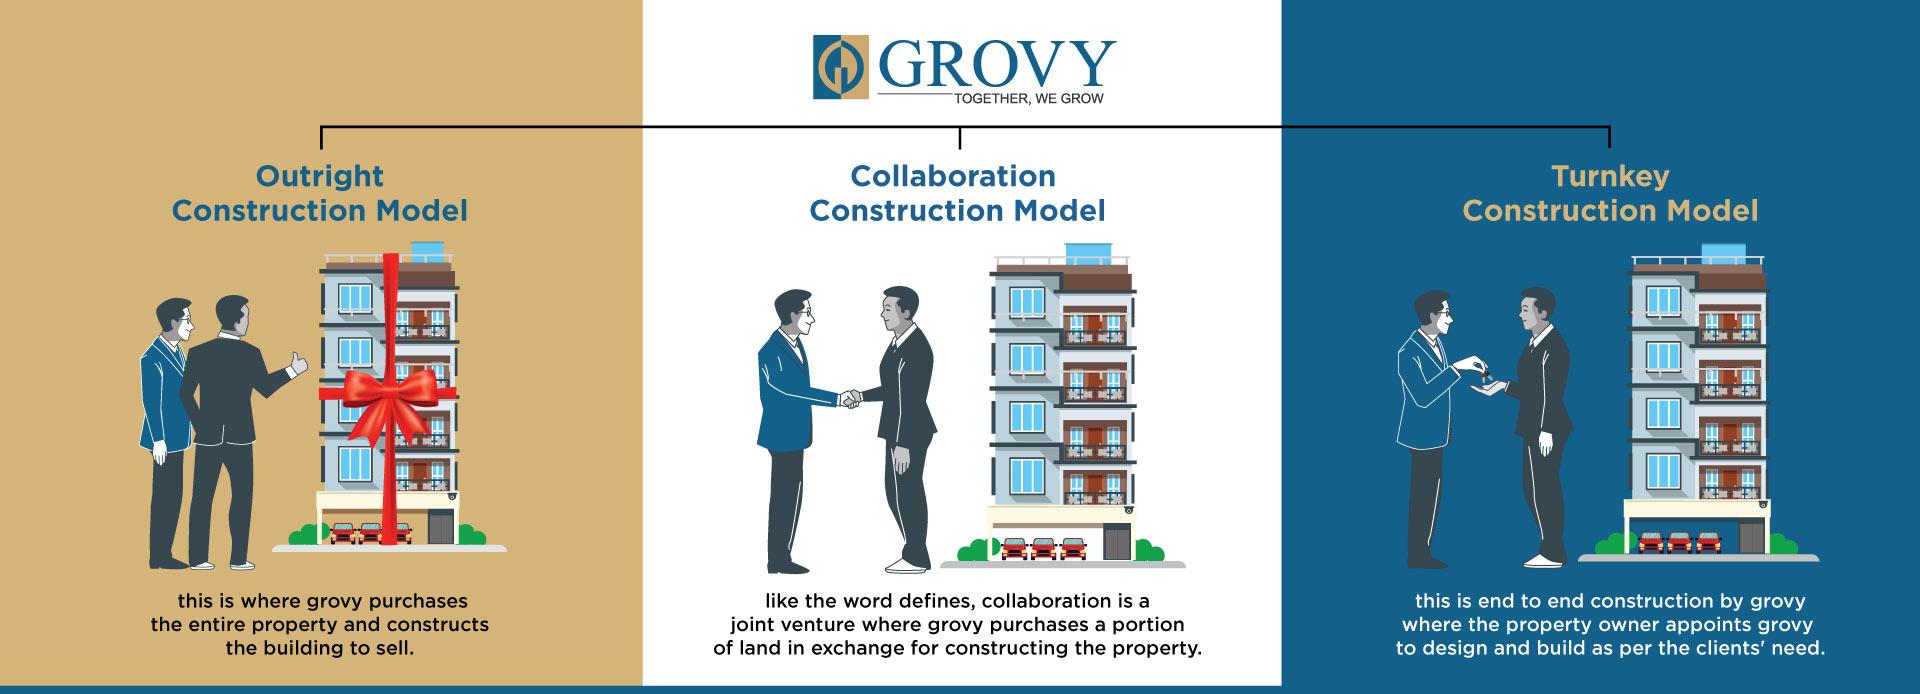 Grovy construction model